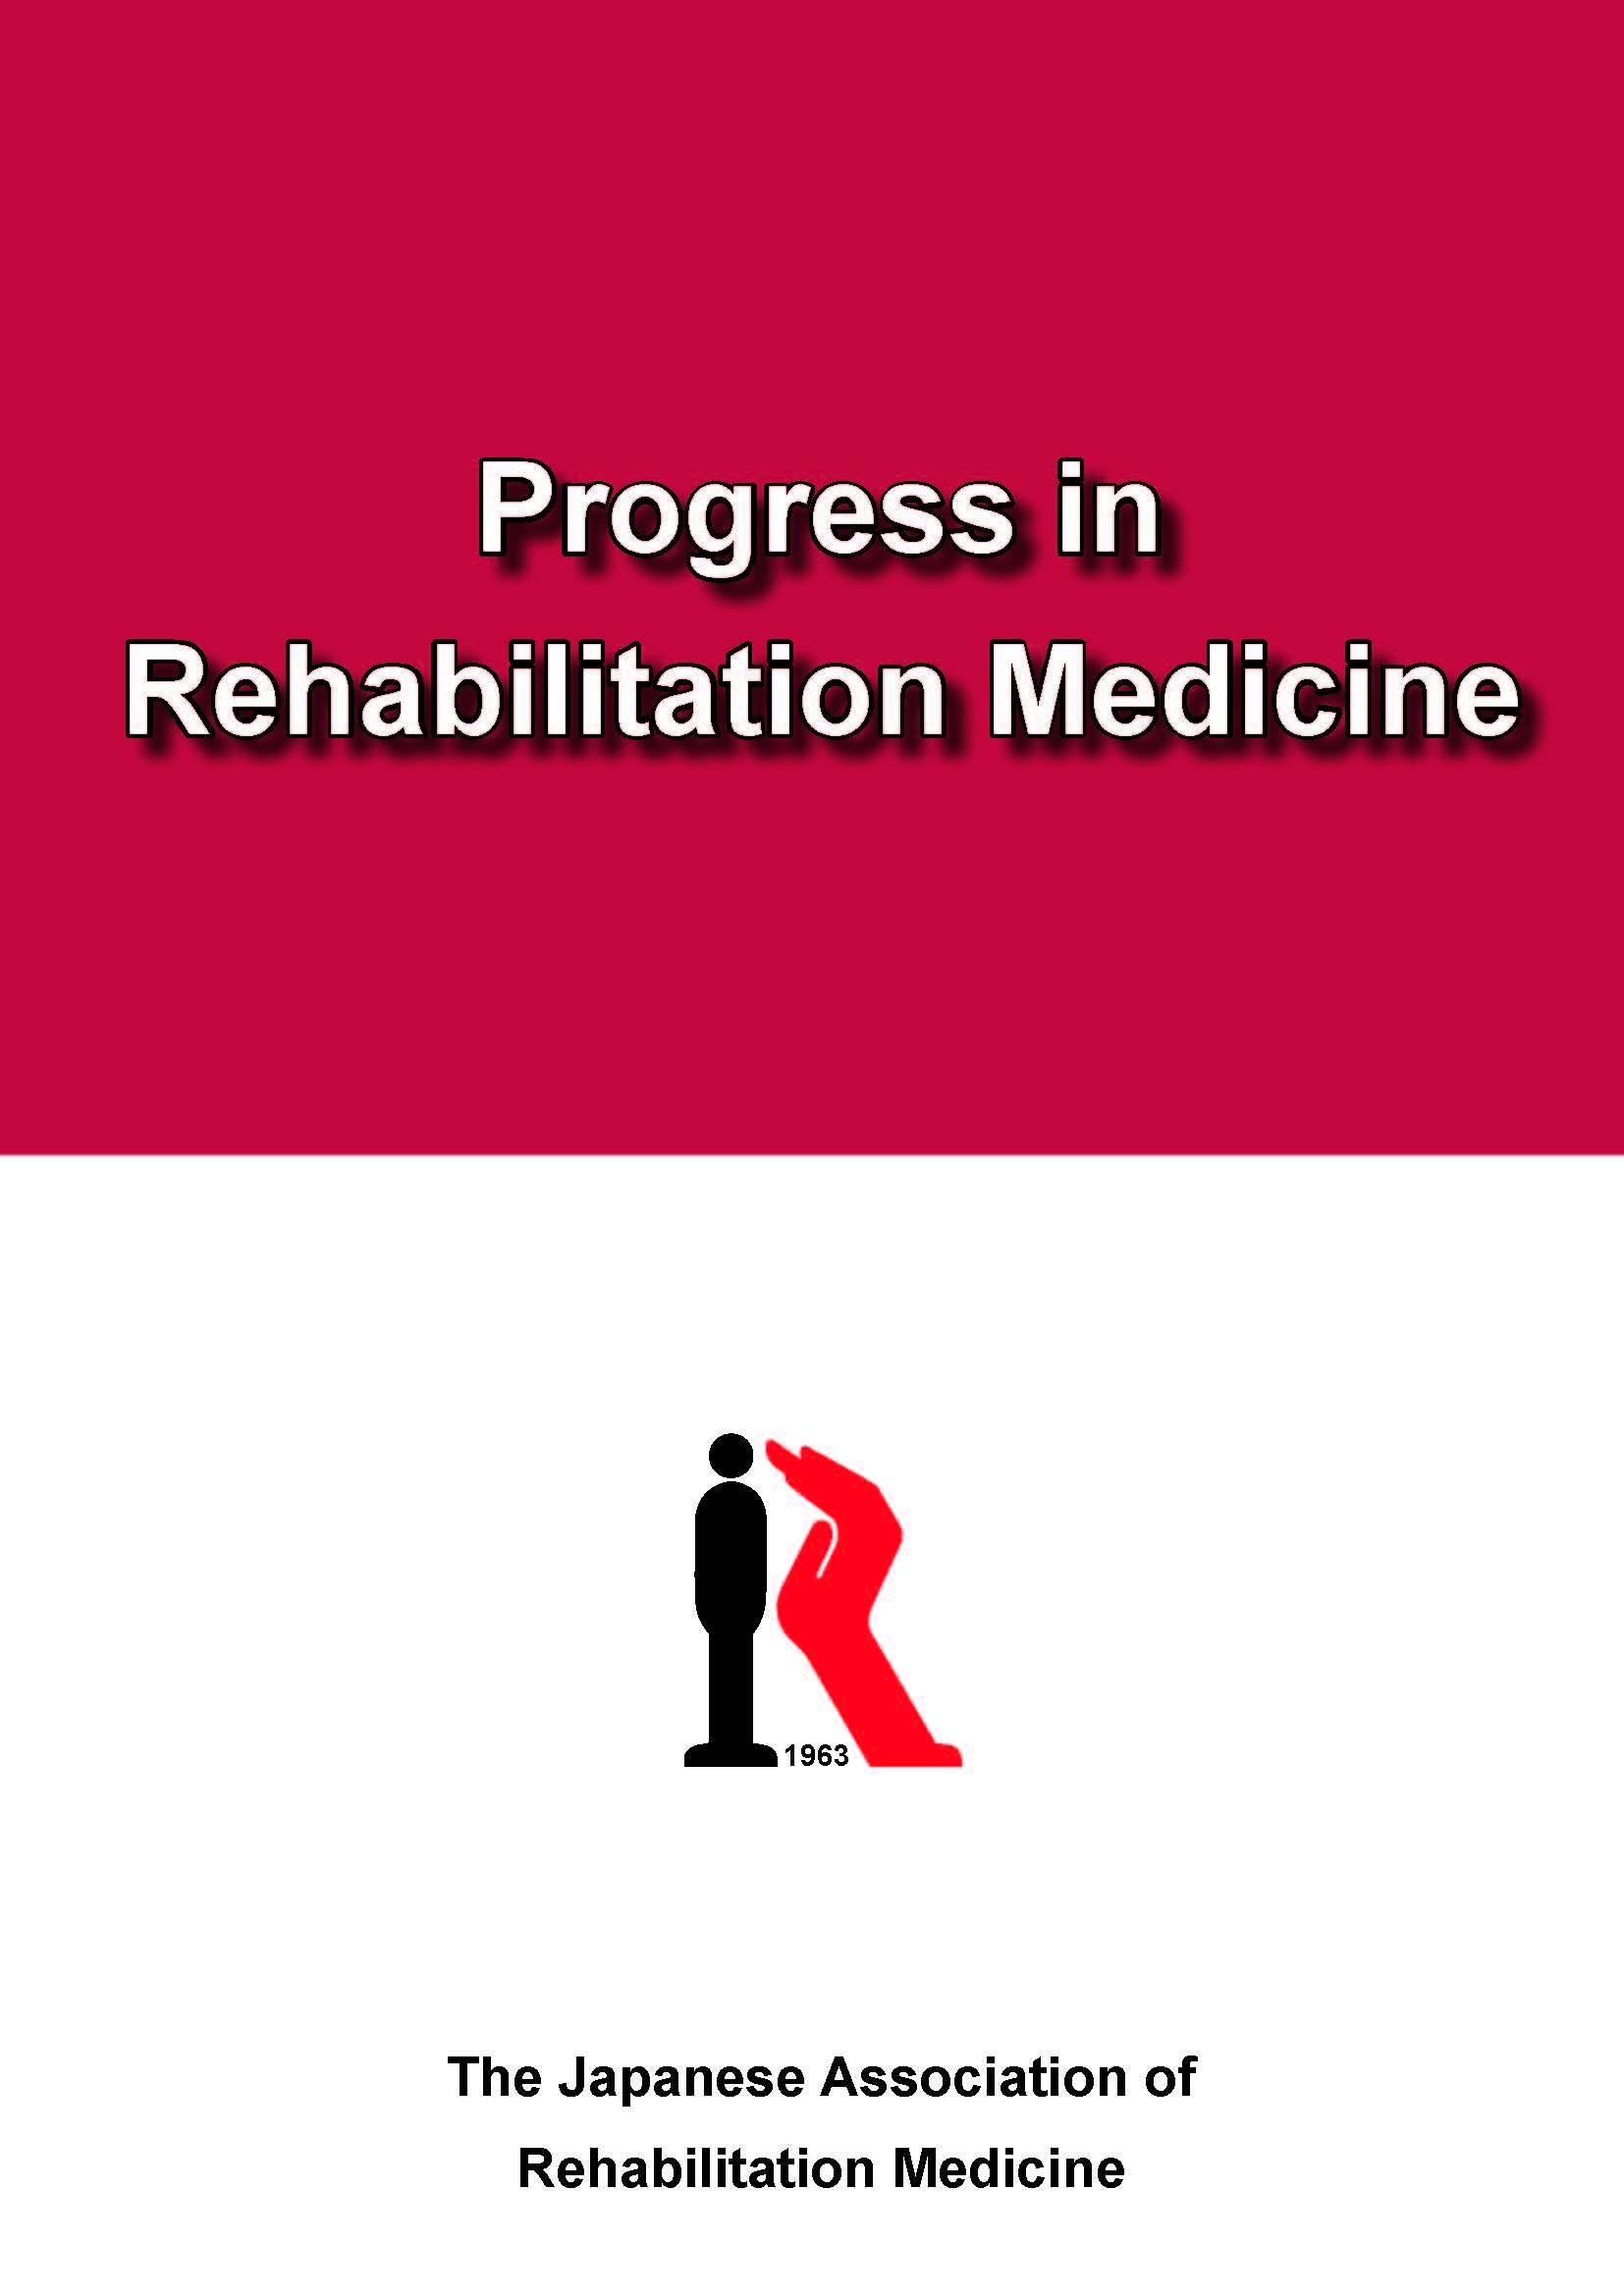 Progress in Rehabilitation Medicine